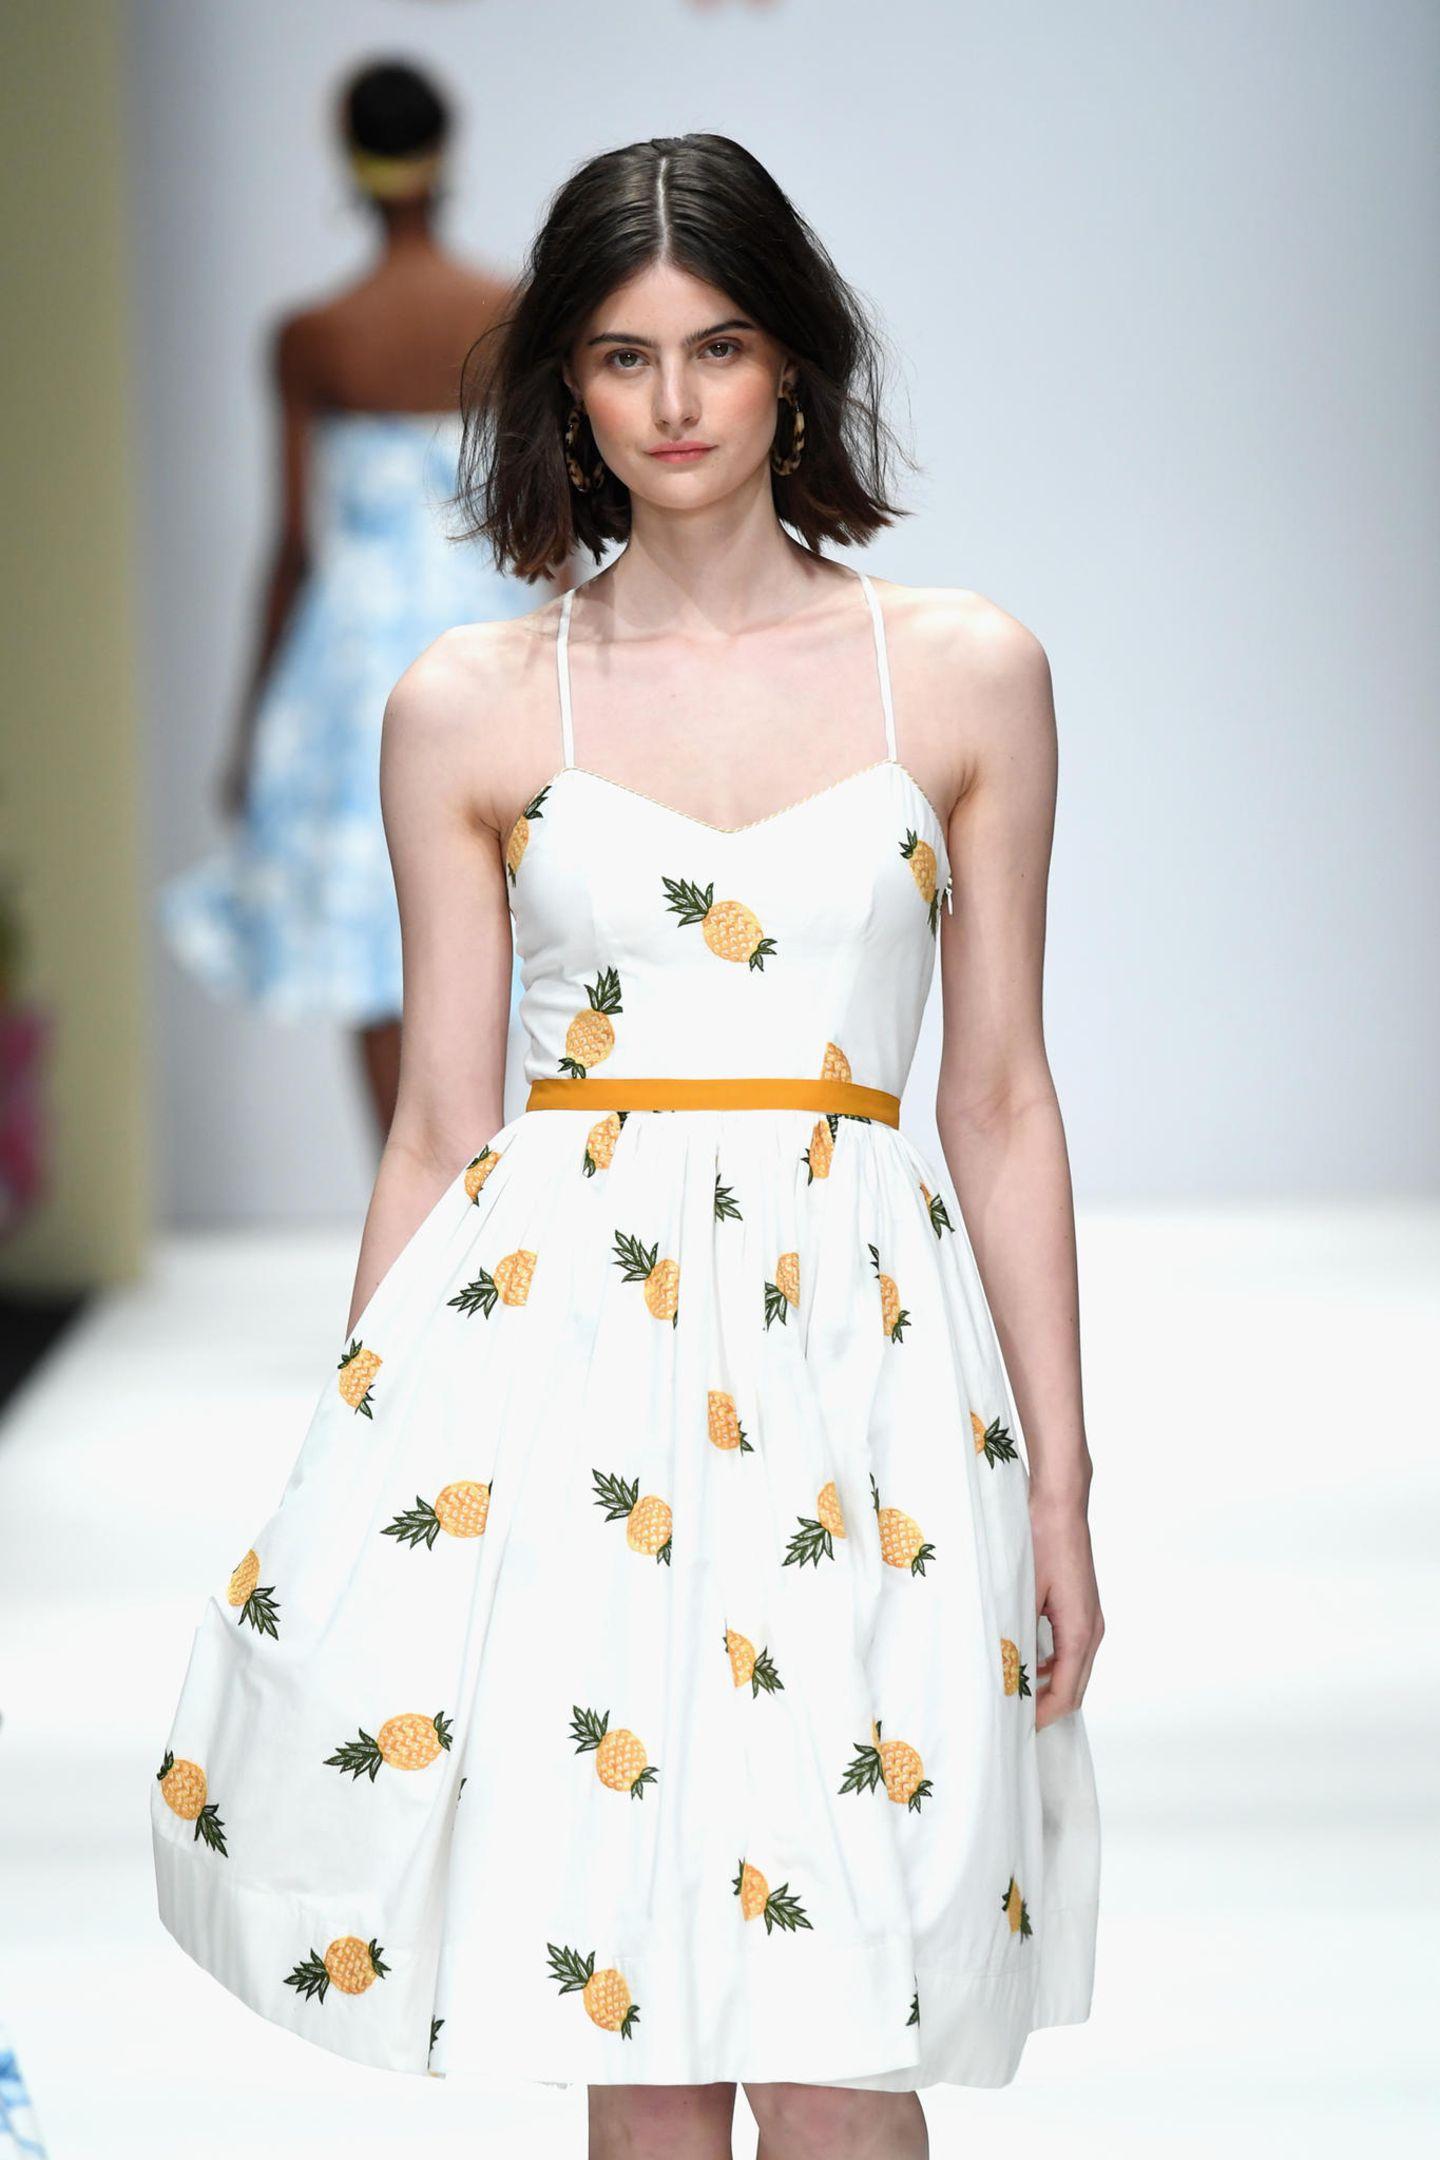 Berlin Fashion Week: Lena Hoschek